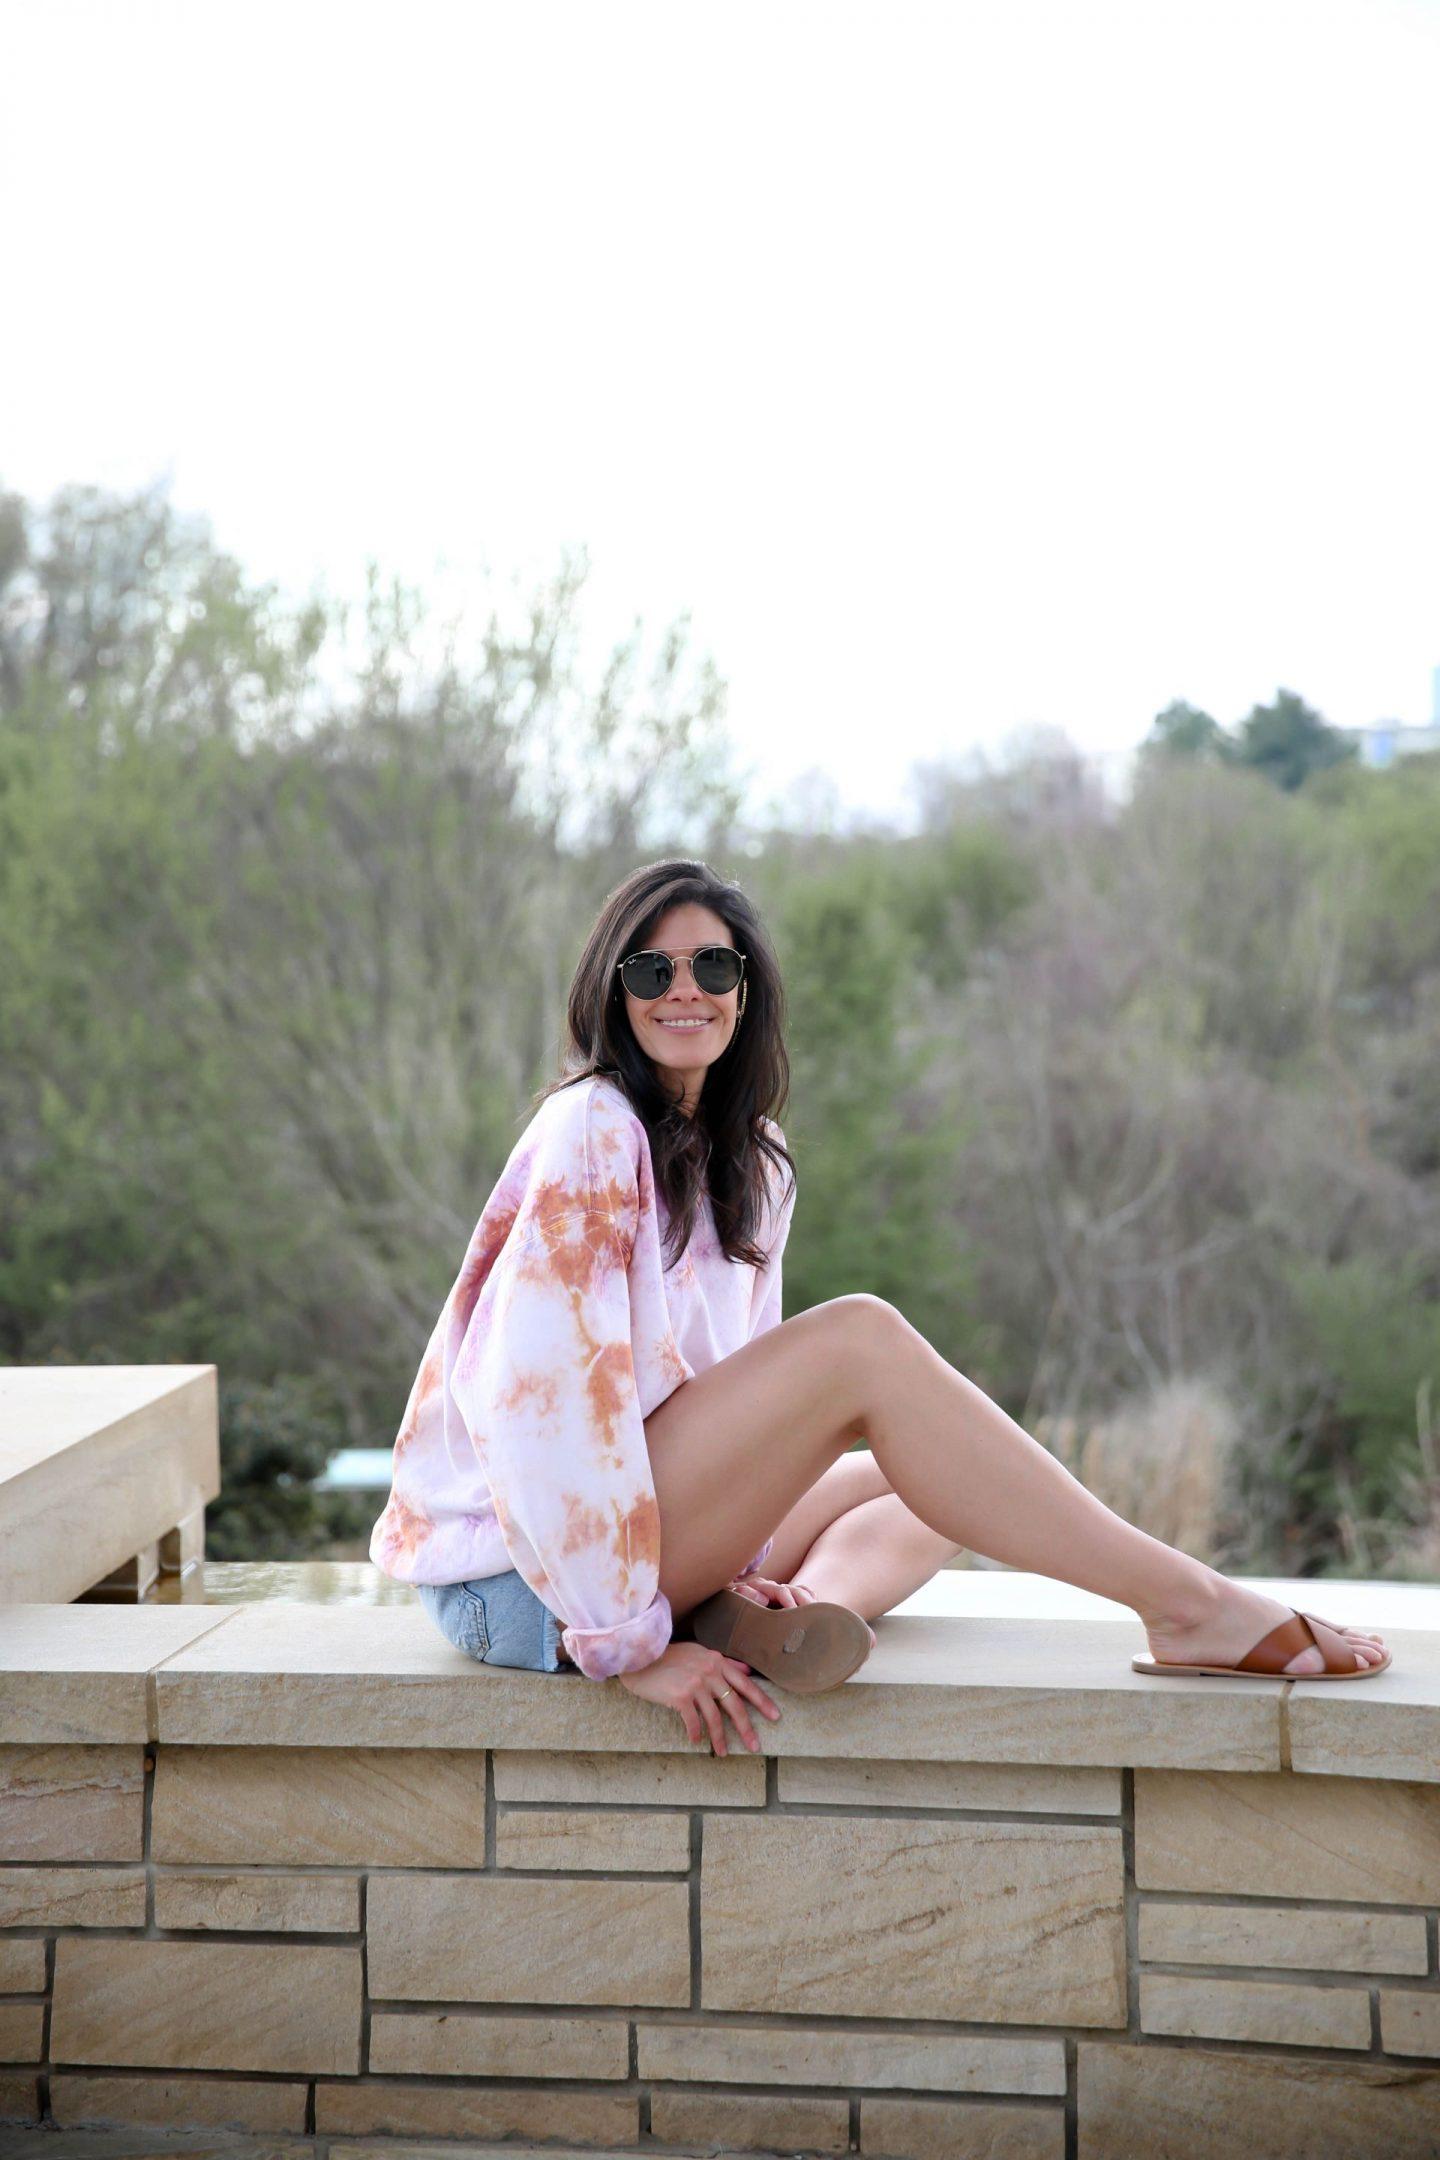 casual chic - summer style - tie dye - Lauren Schwaiger